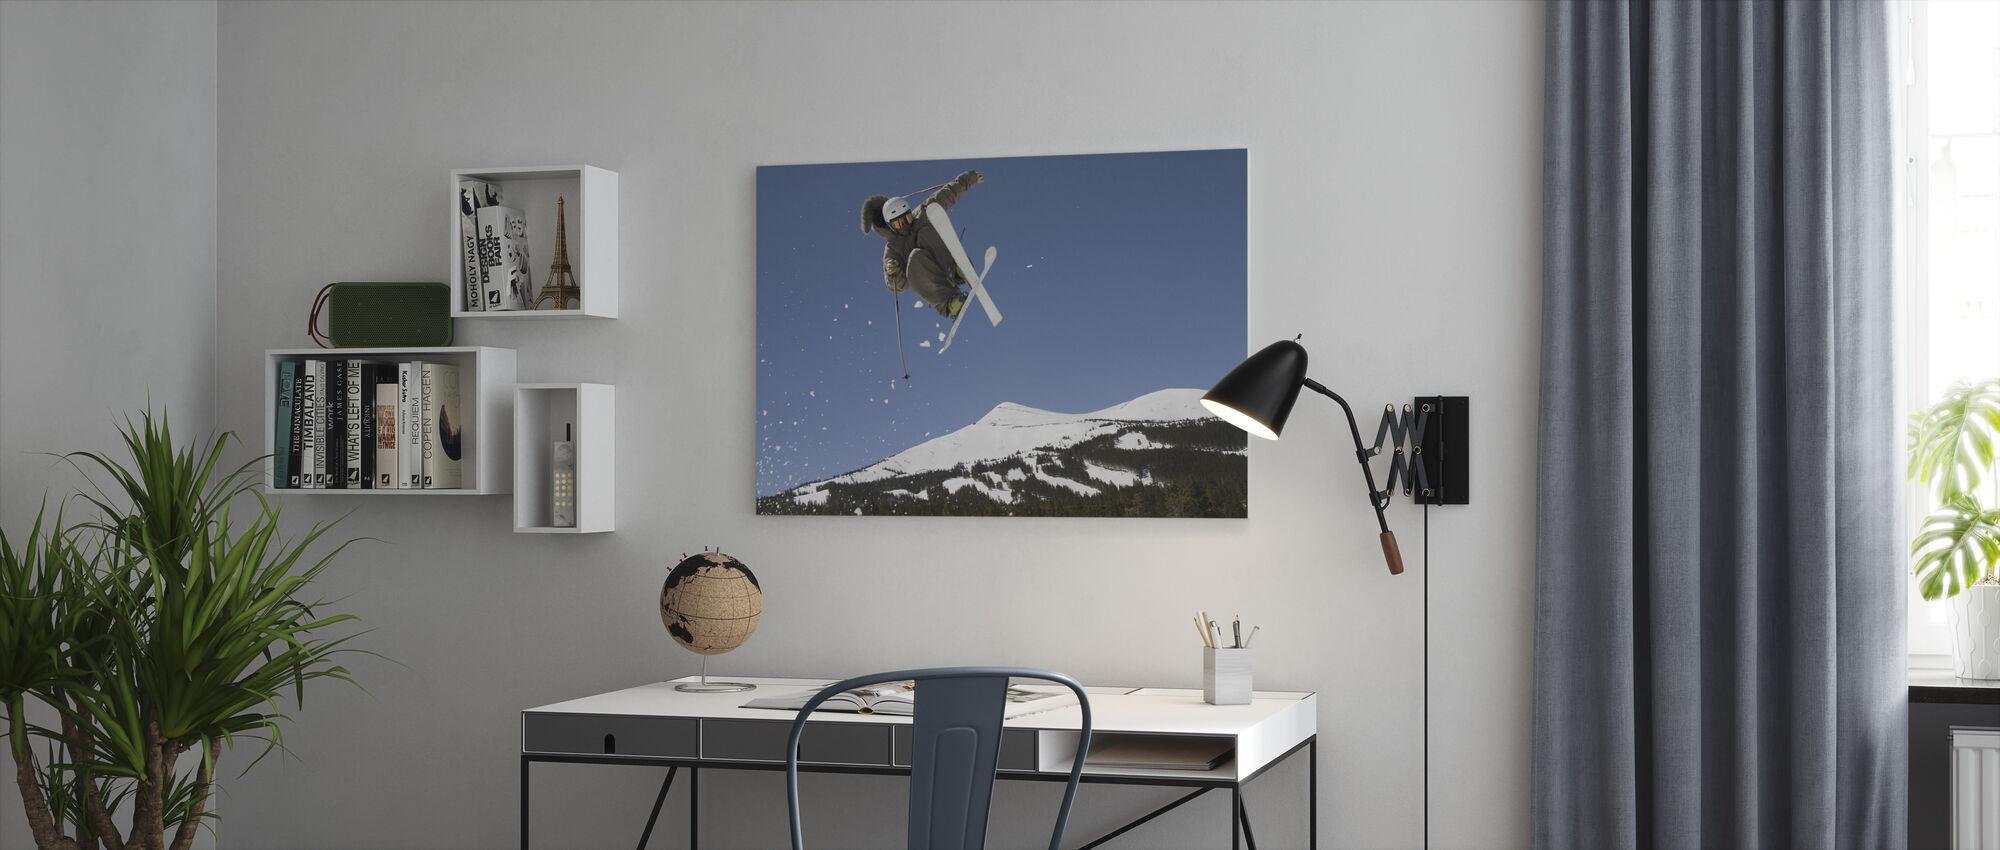 Superpipe Skier - Canvas print - Office